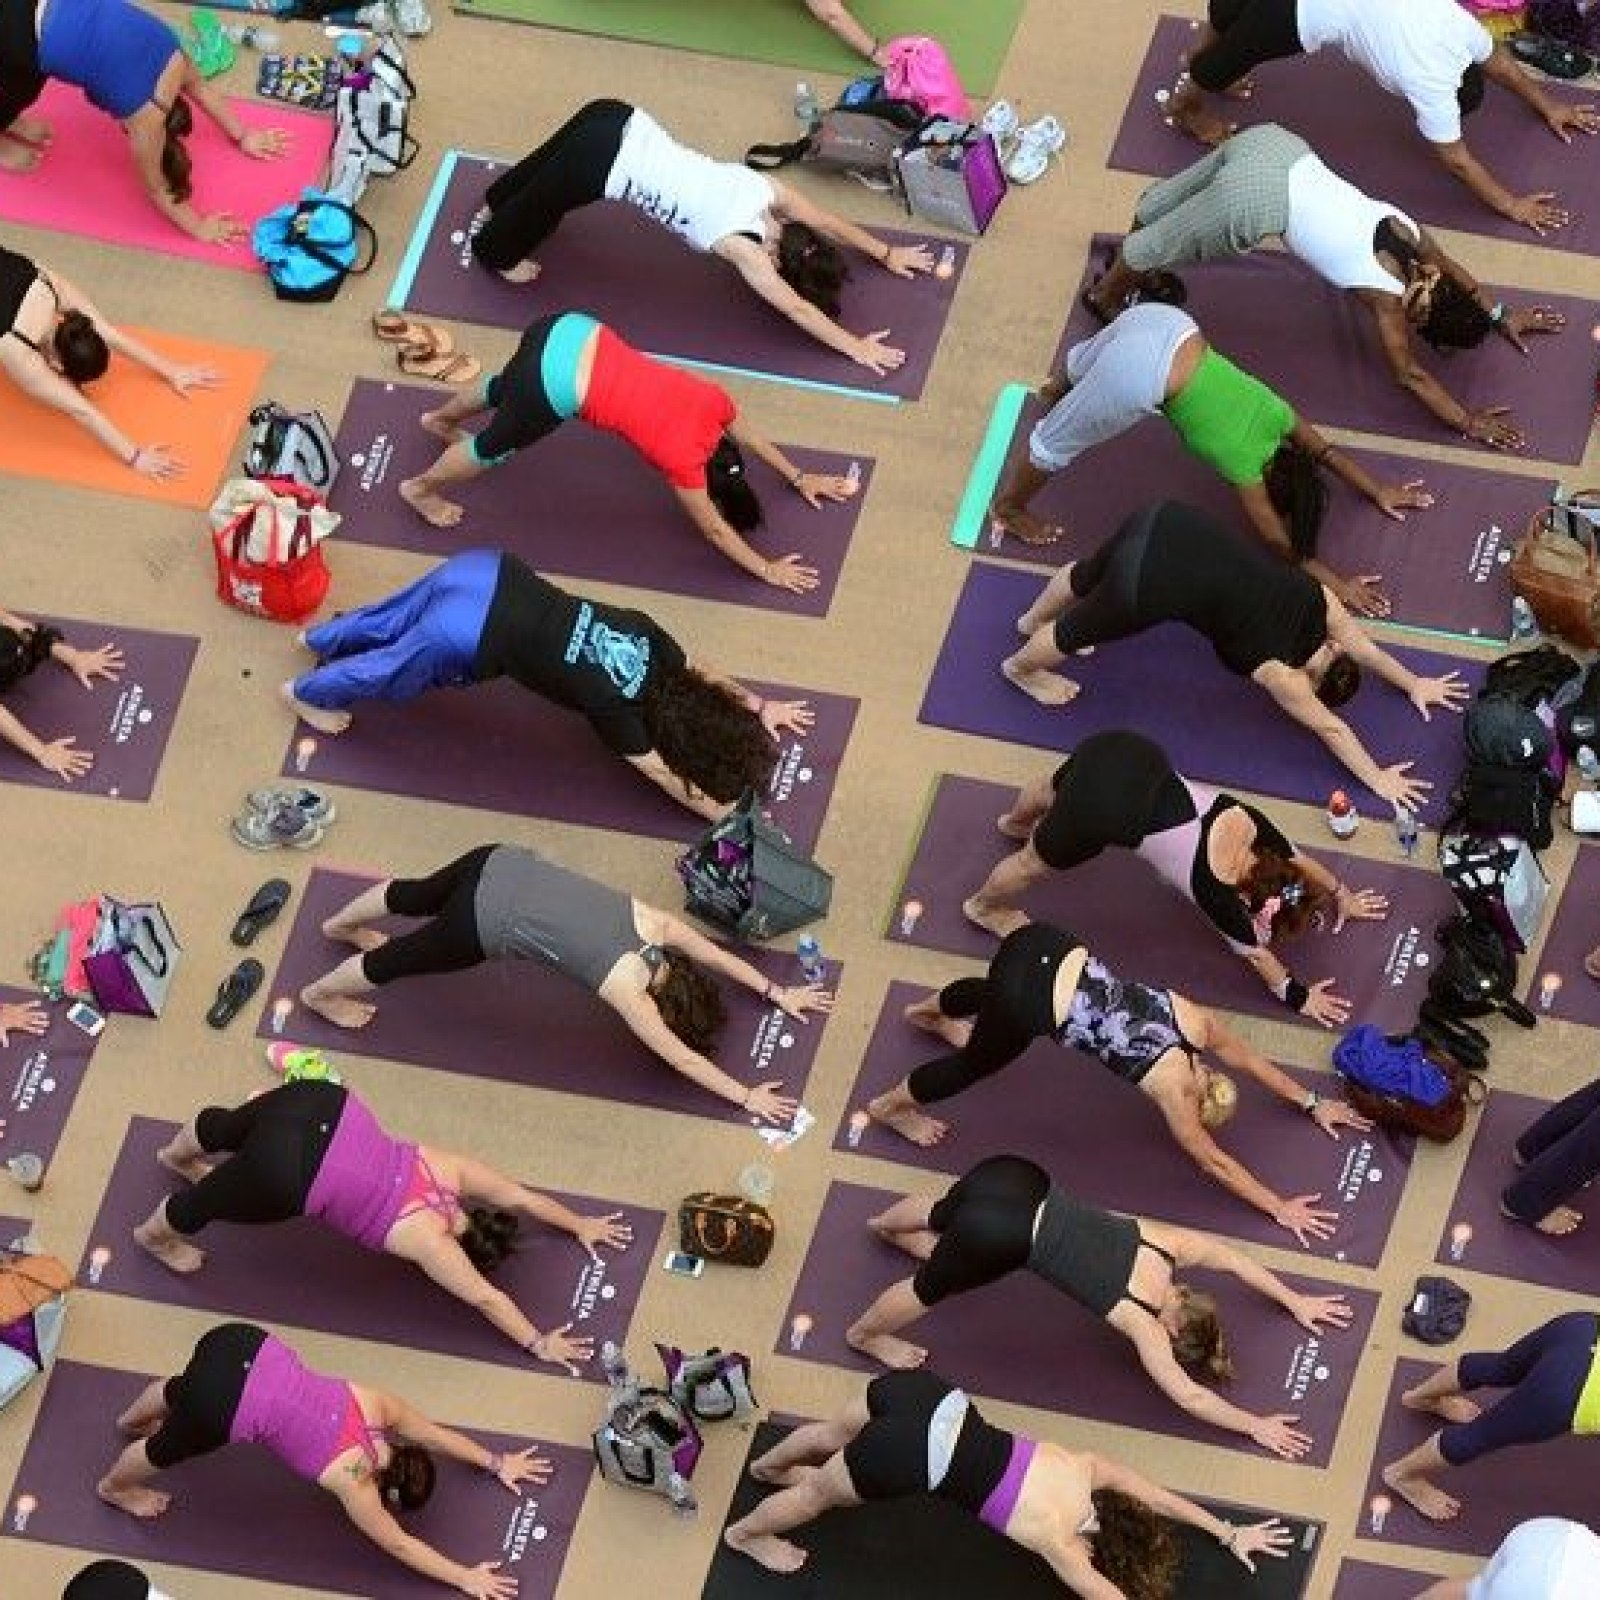 d844455f7c35dd Plus-Sized Women Want Yoga Chic, Too